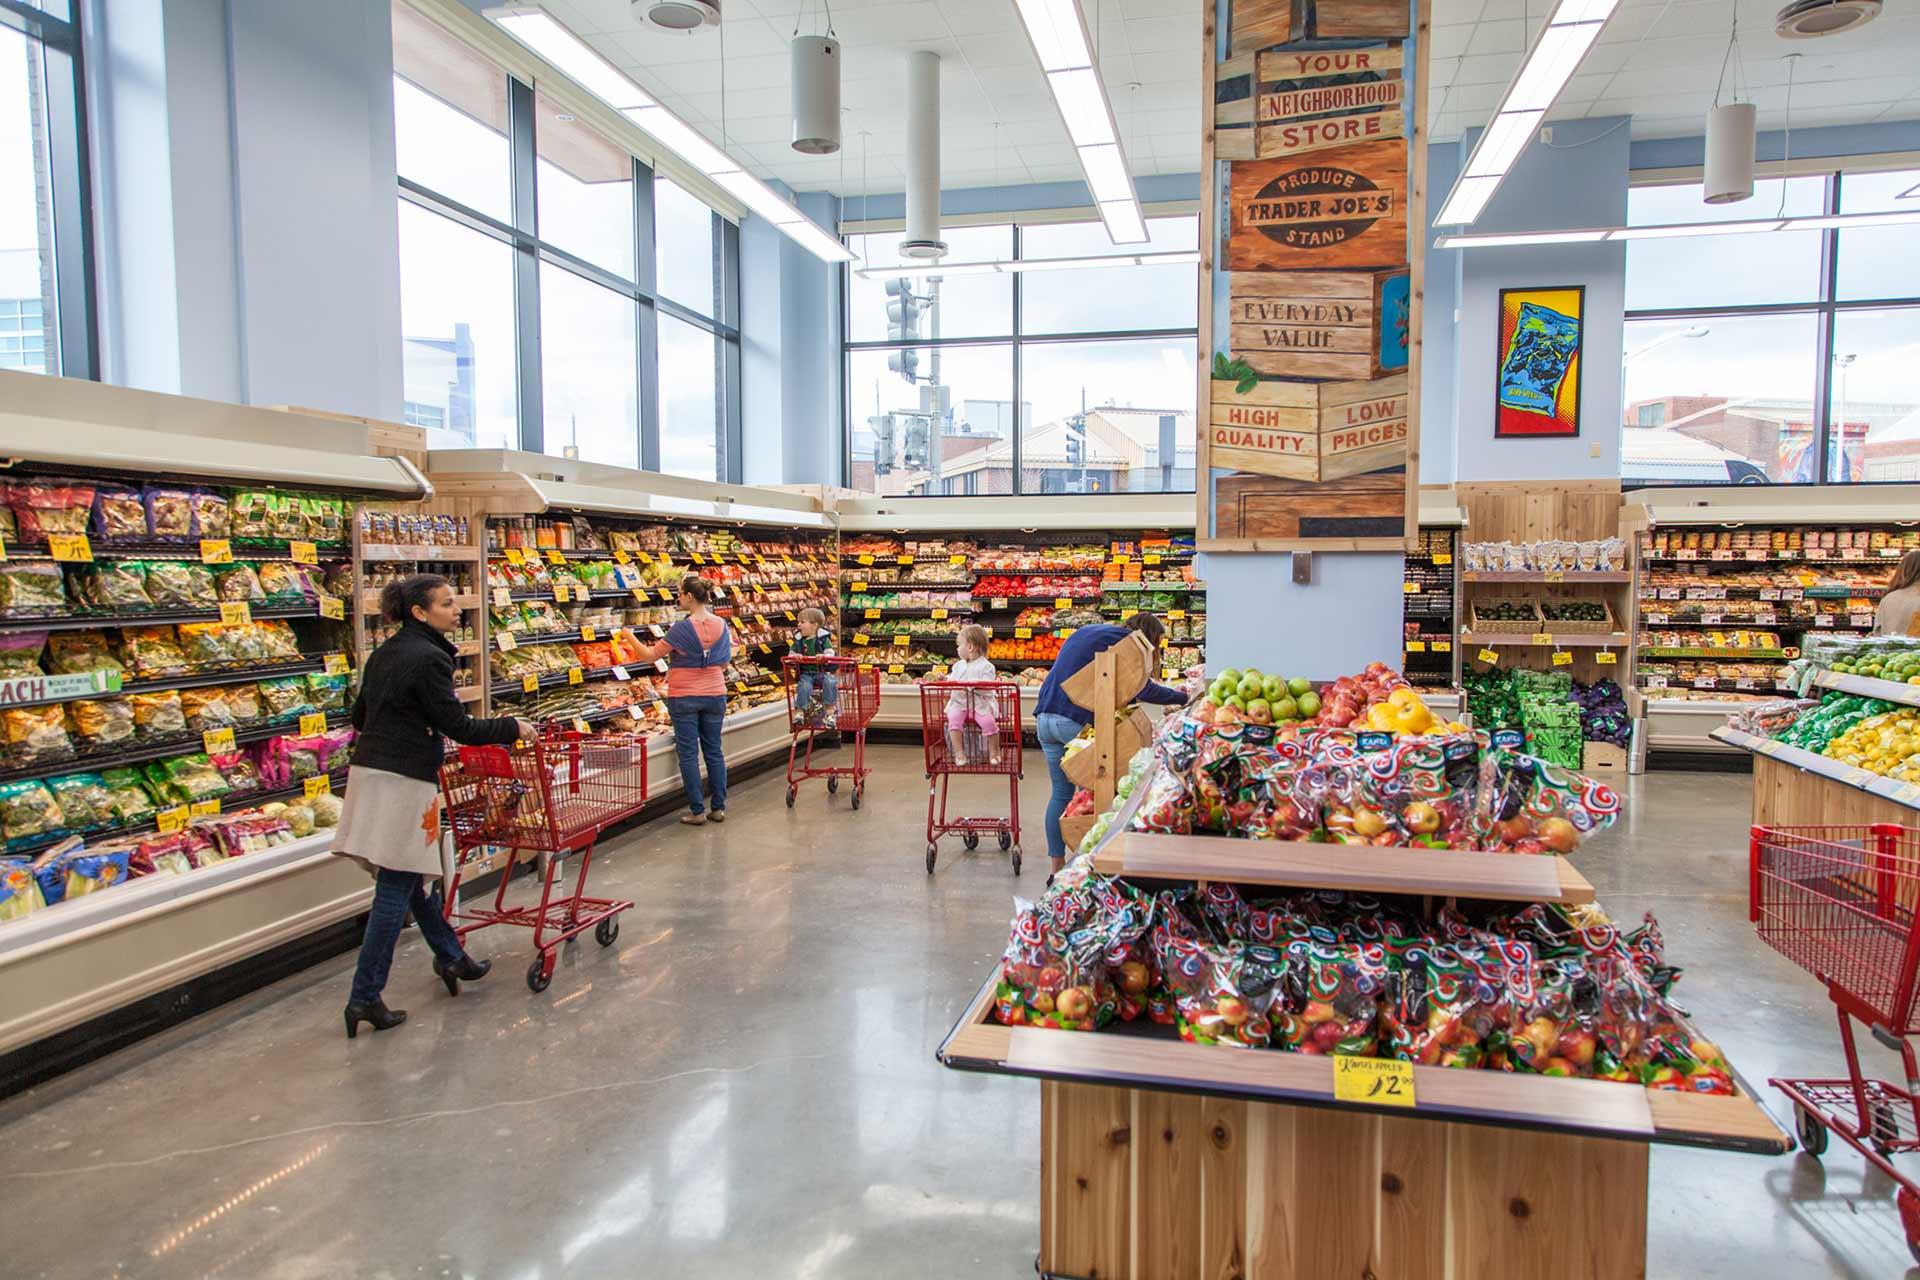 trader joes supermarket produce area